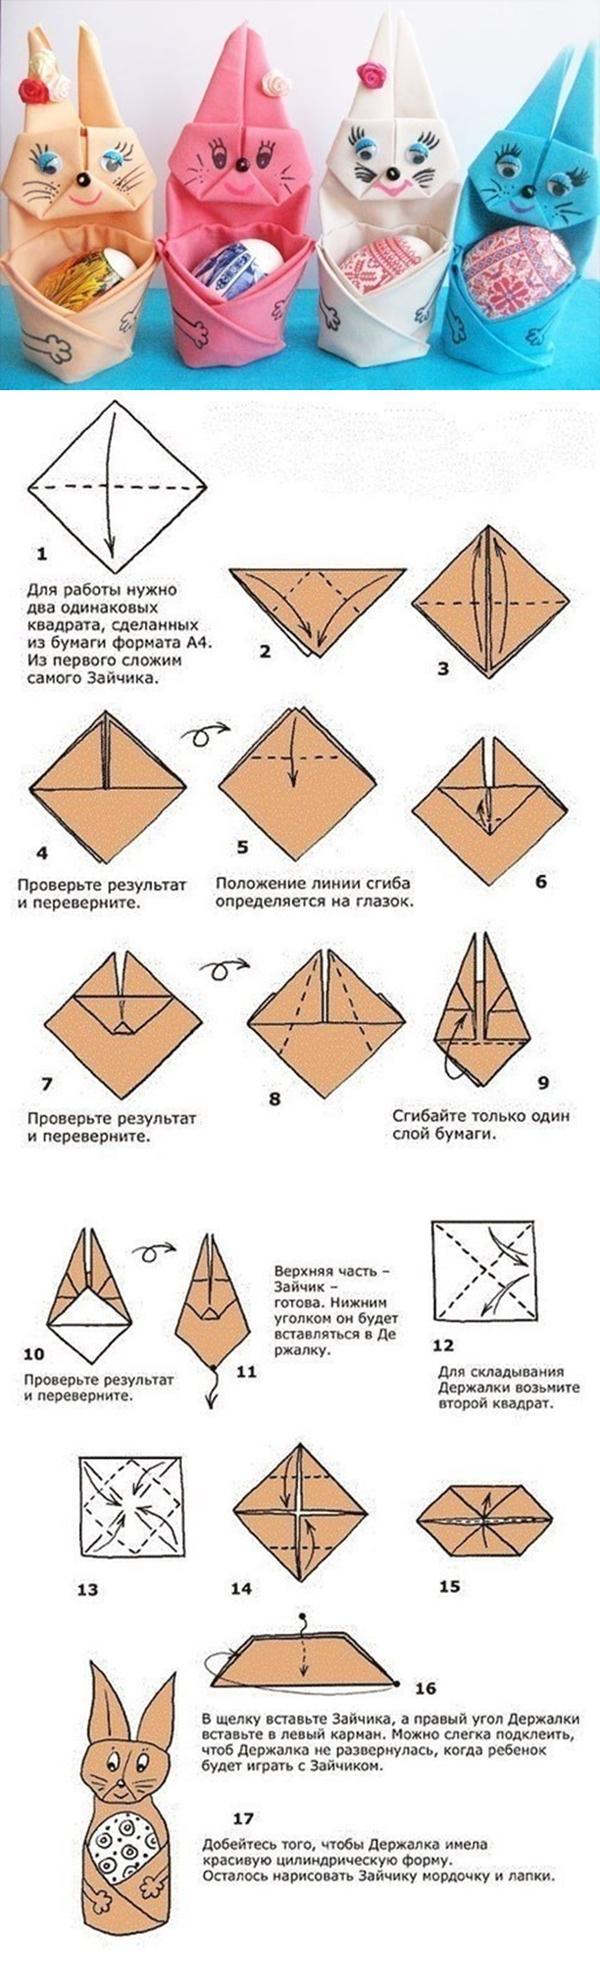 folded bunny tutorial